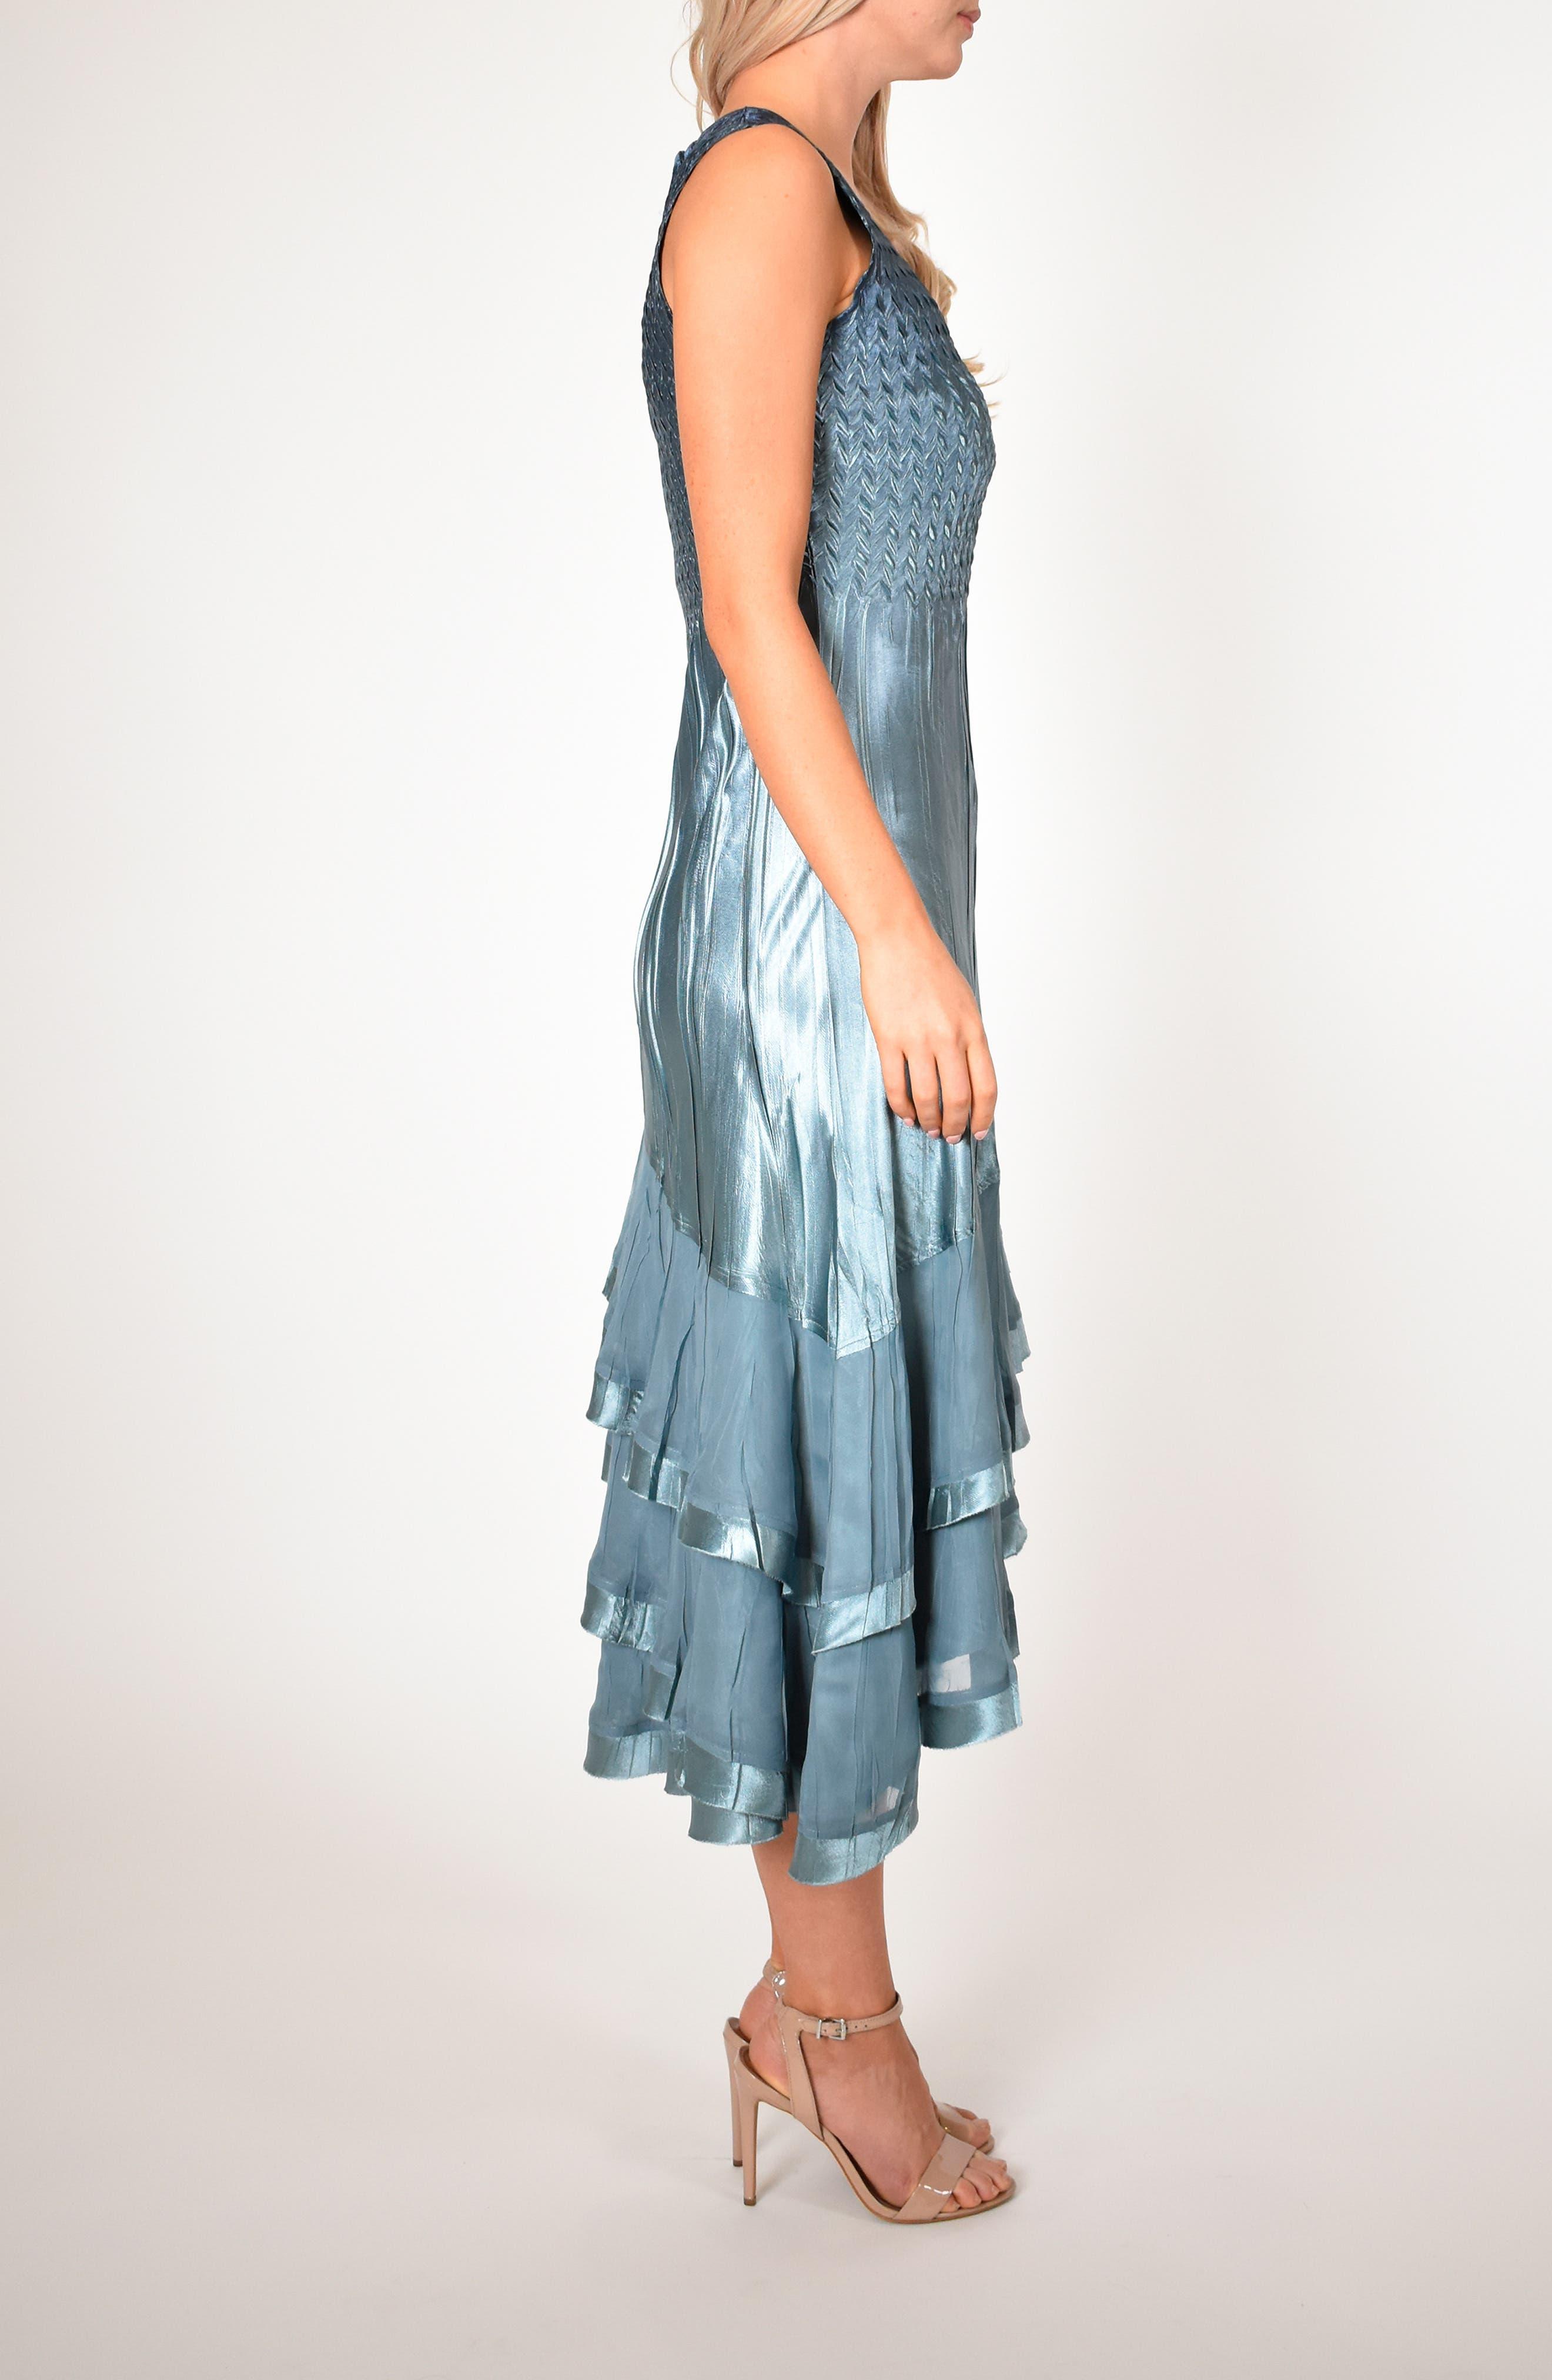 KOMAROV, Asymmetrical Jacket Dress, Alternate thumbnail 9, color, SILVER BLUE NIGHT OMBRE